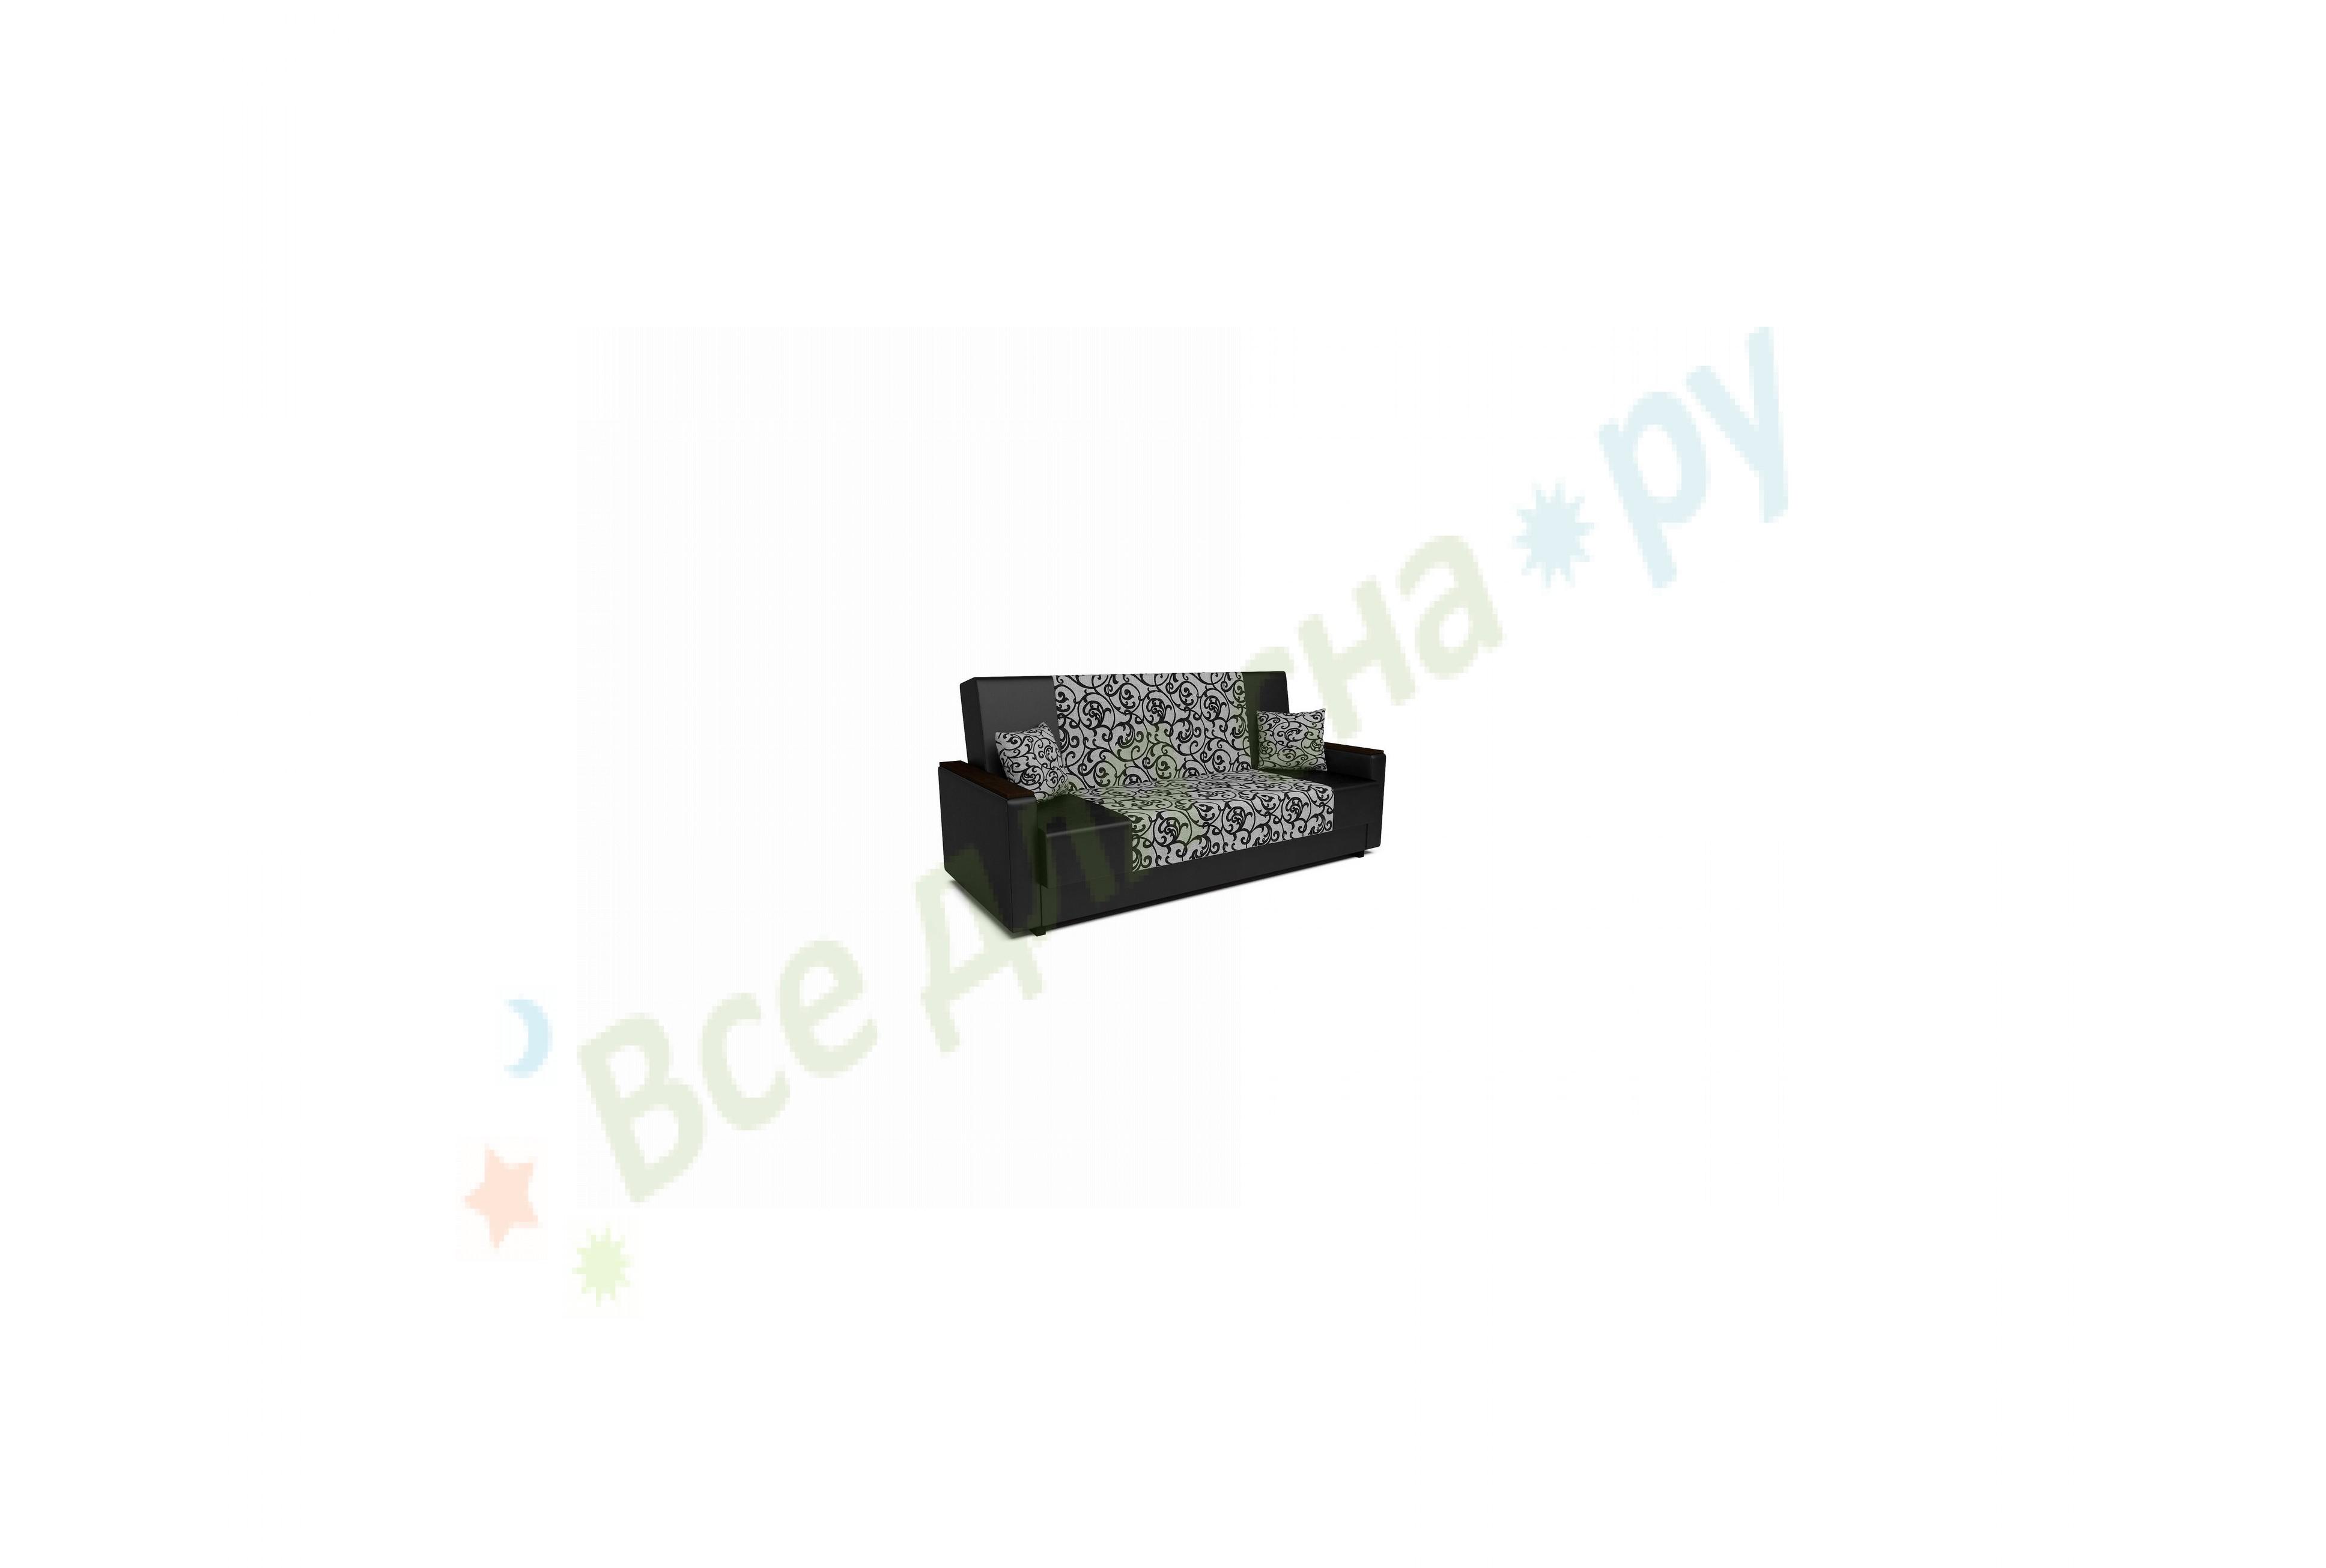 кресла-кровати без подлокотников аккордеон